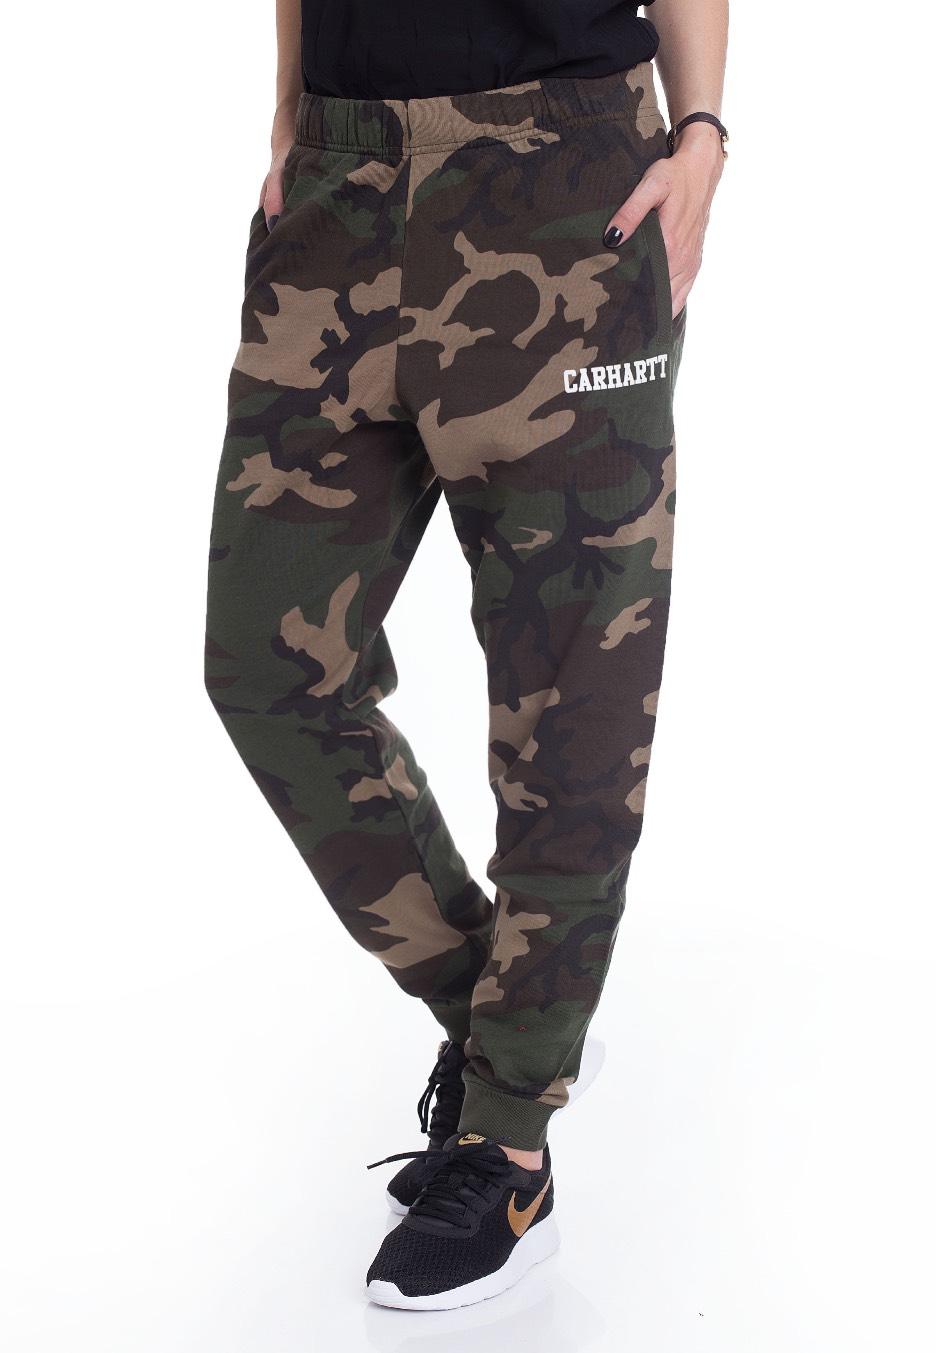 Carhartt Girls Sweatpants